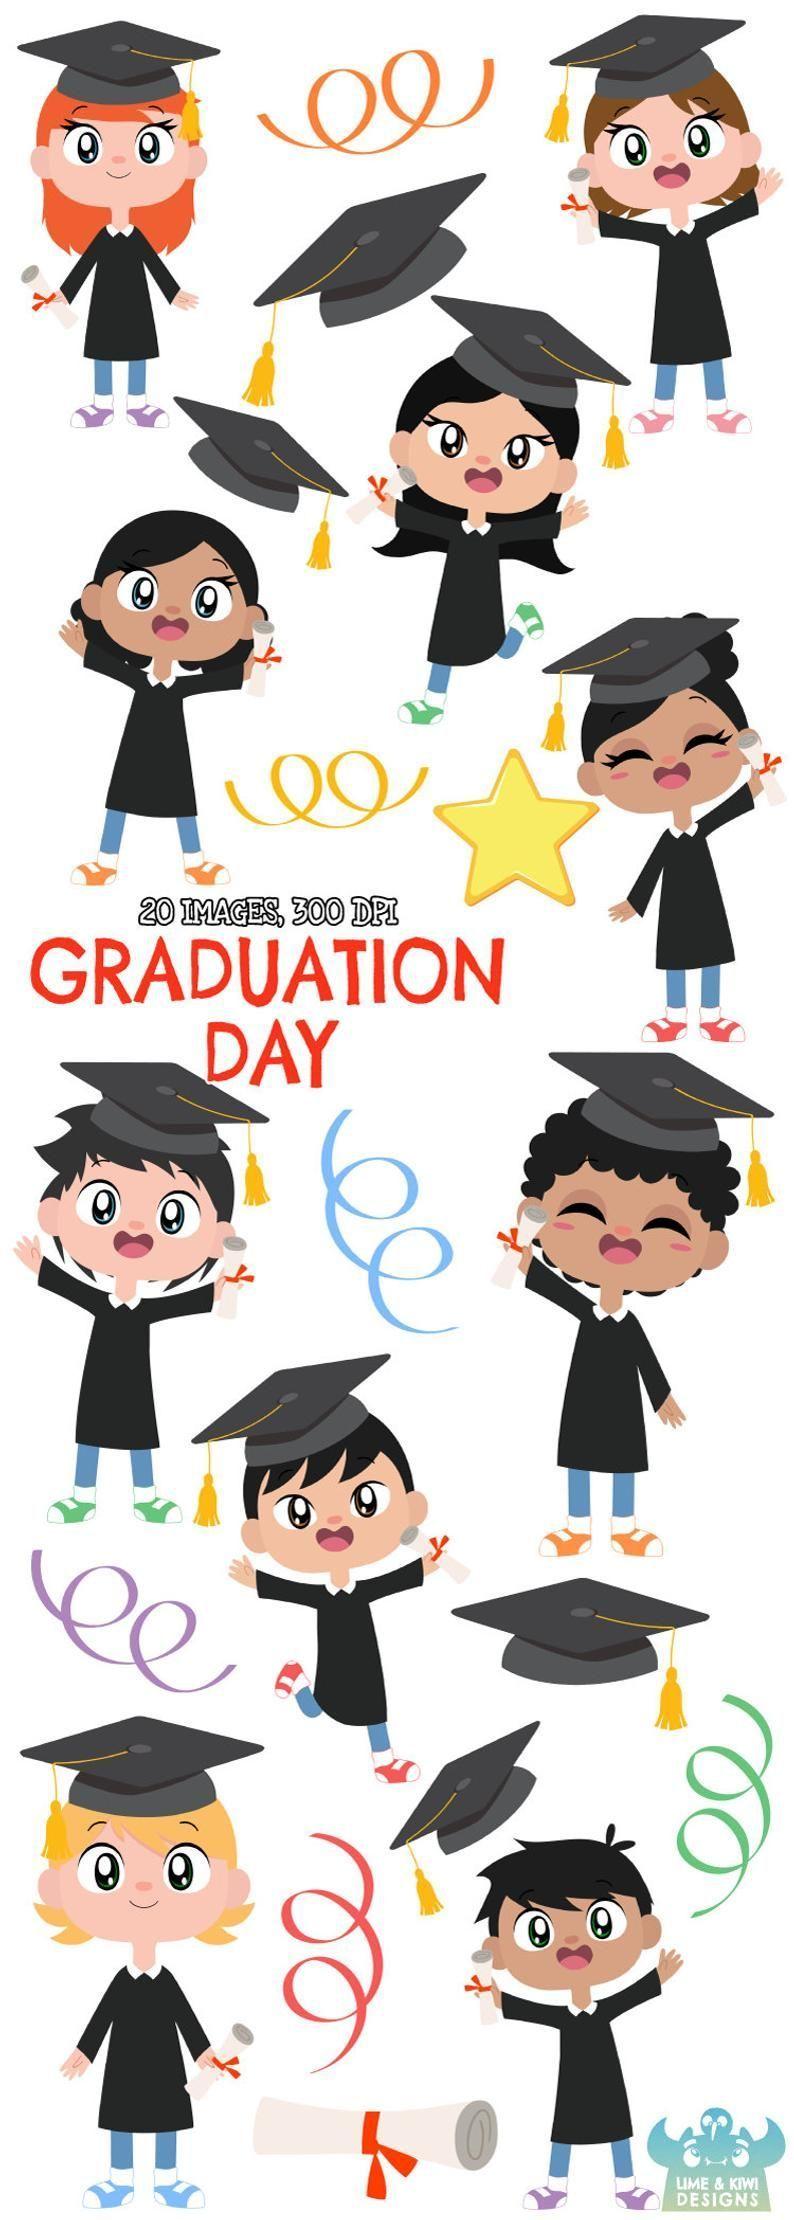 Graduation Day Clipart, Instant Download Vector Art